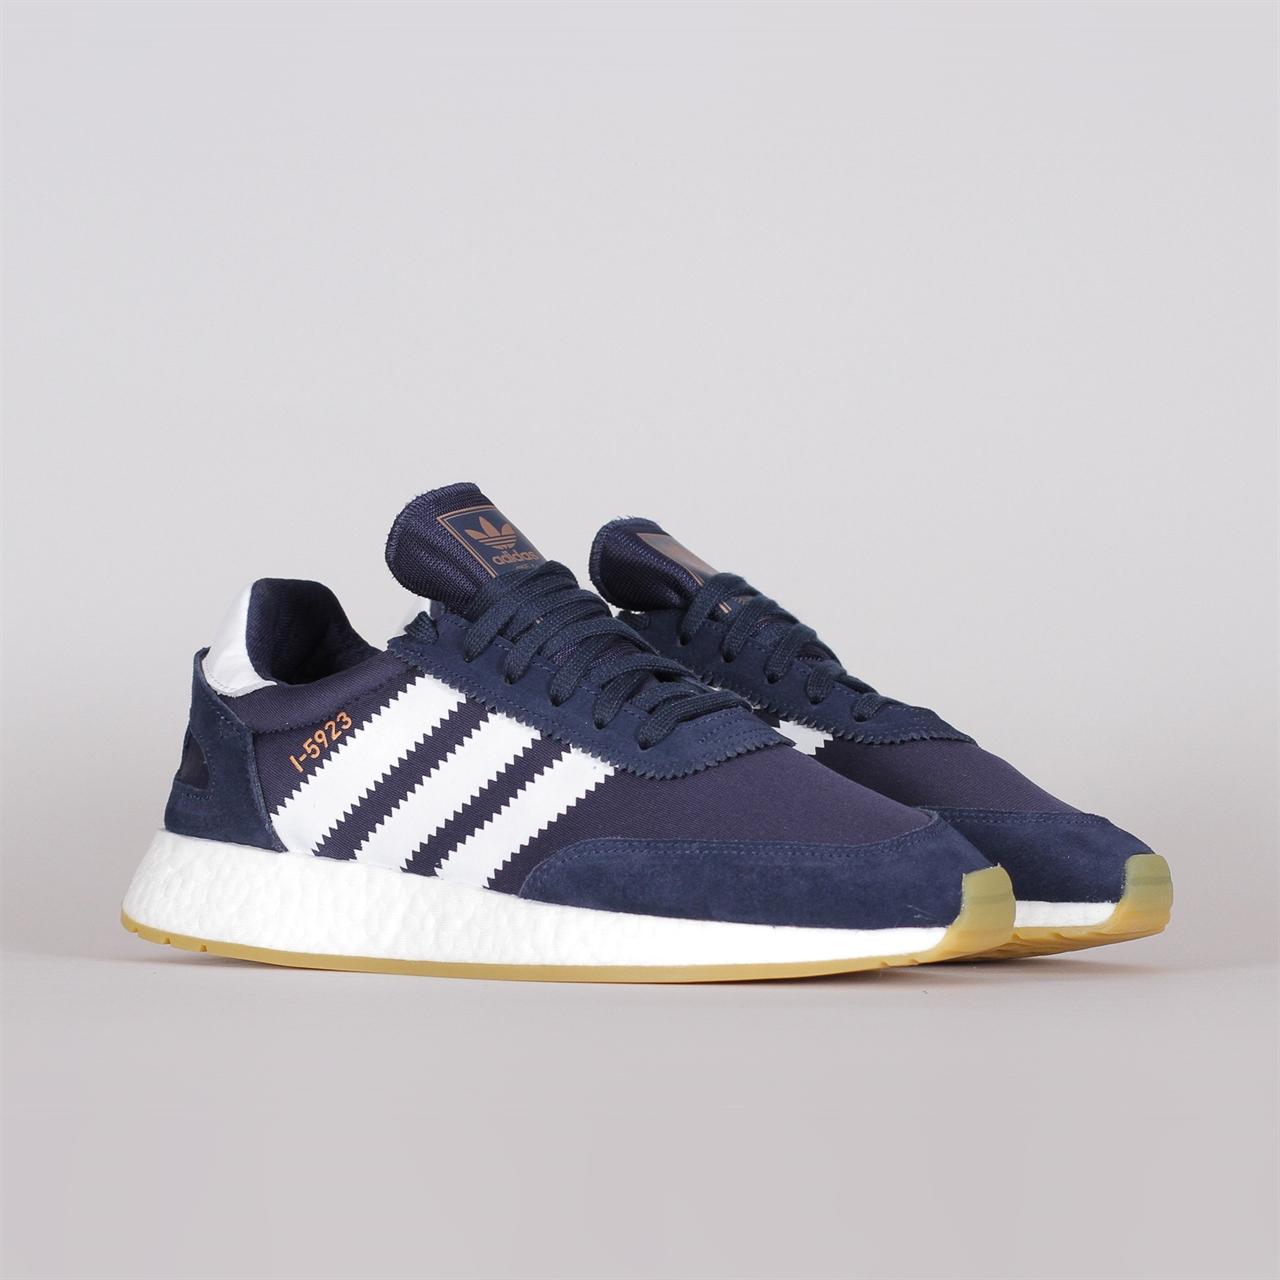 35f1a8e20340 Shelta - Adidas Originals I-5923 (BB2092)